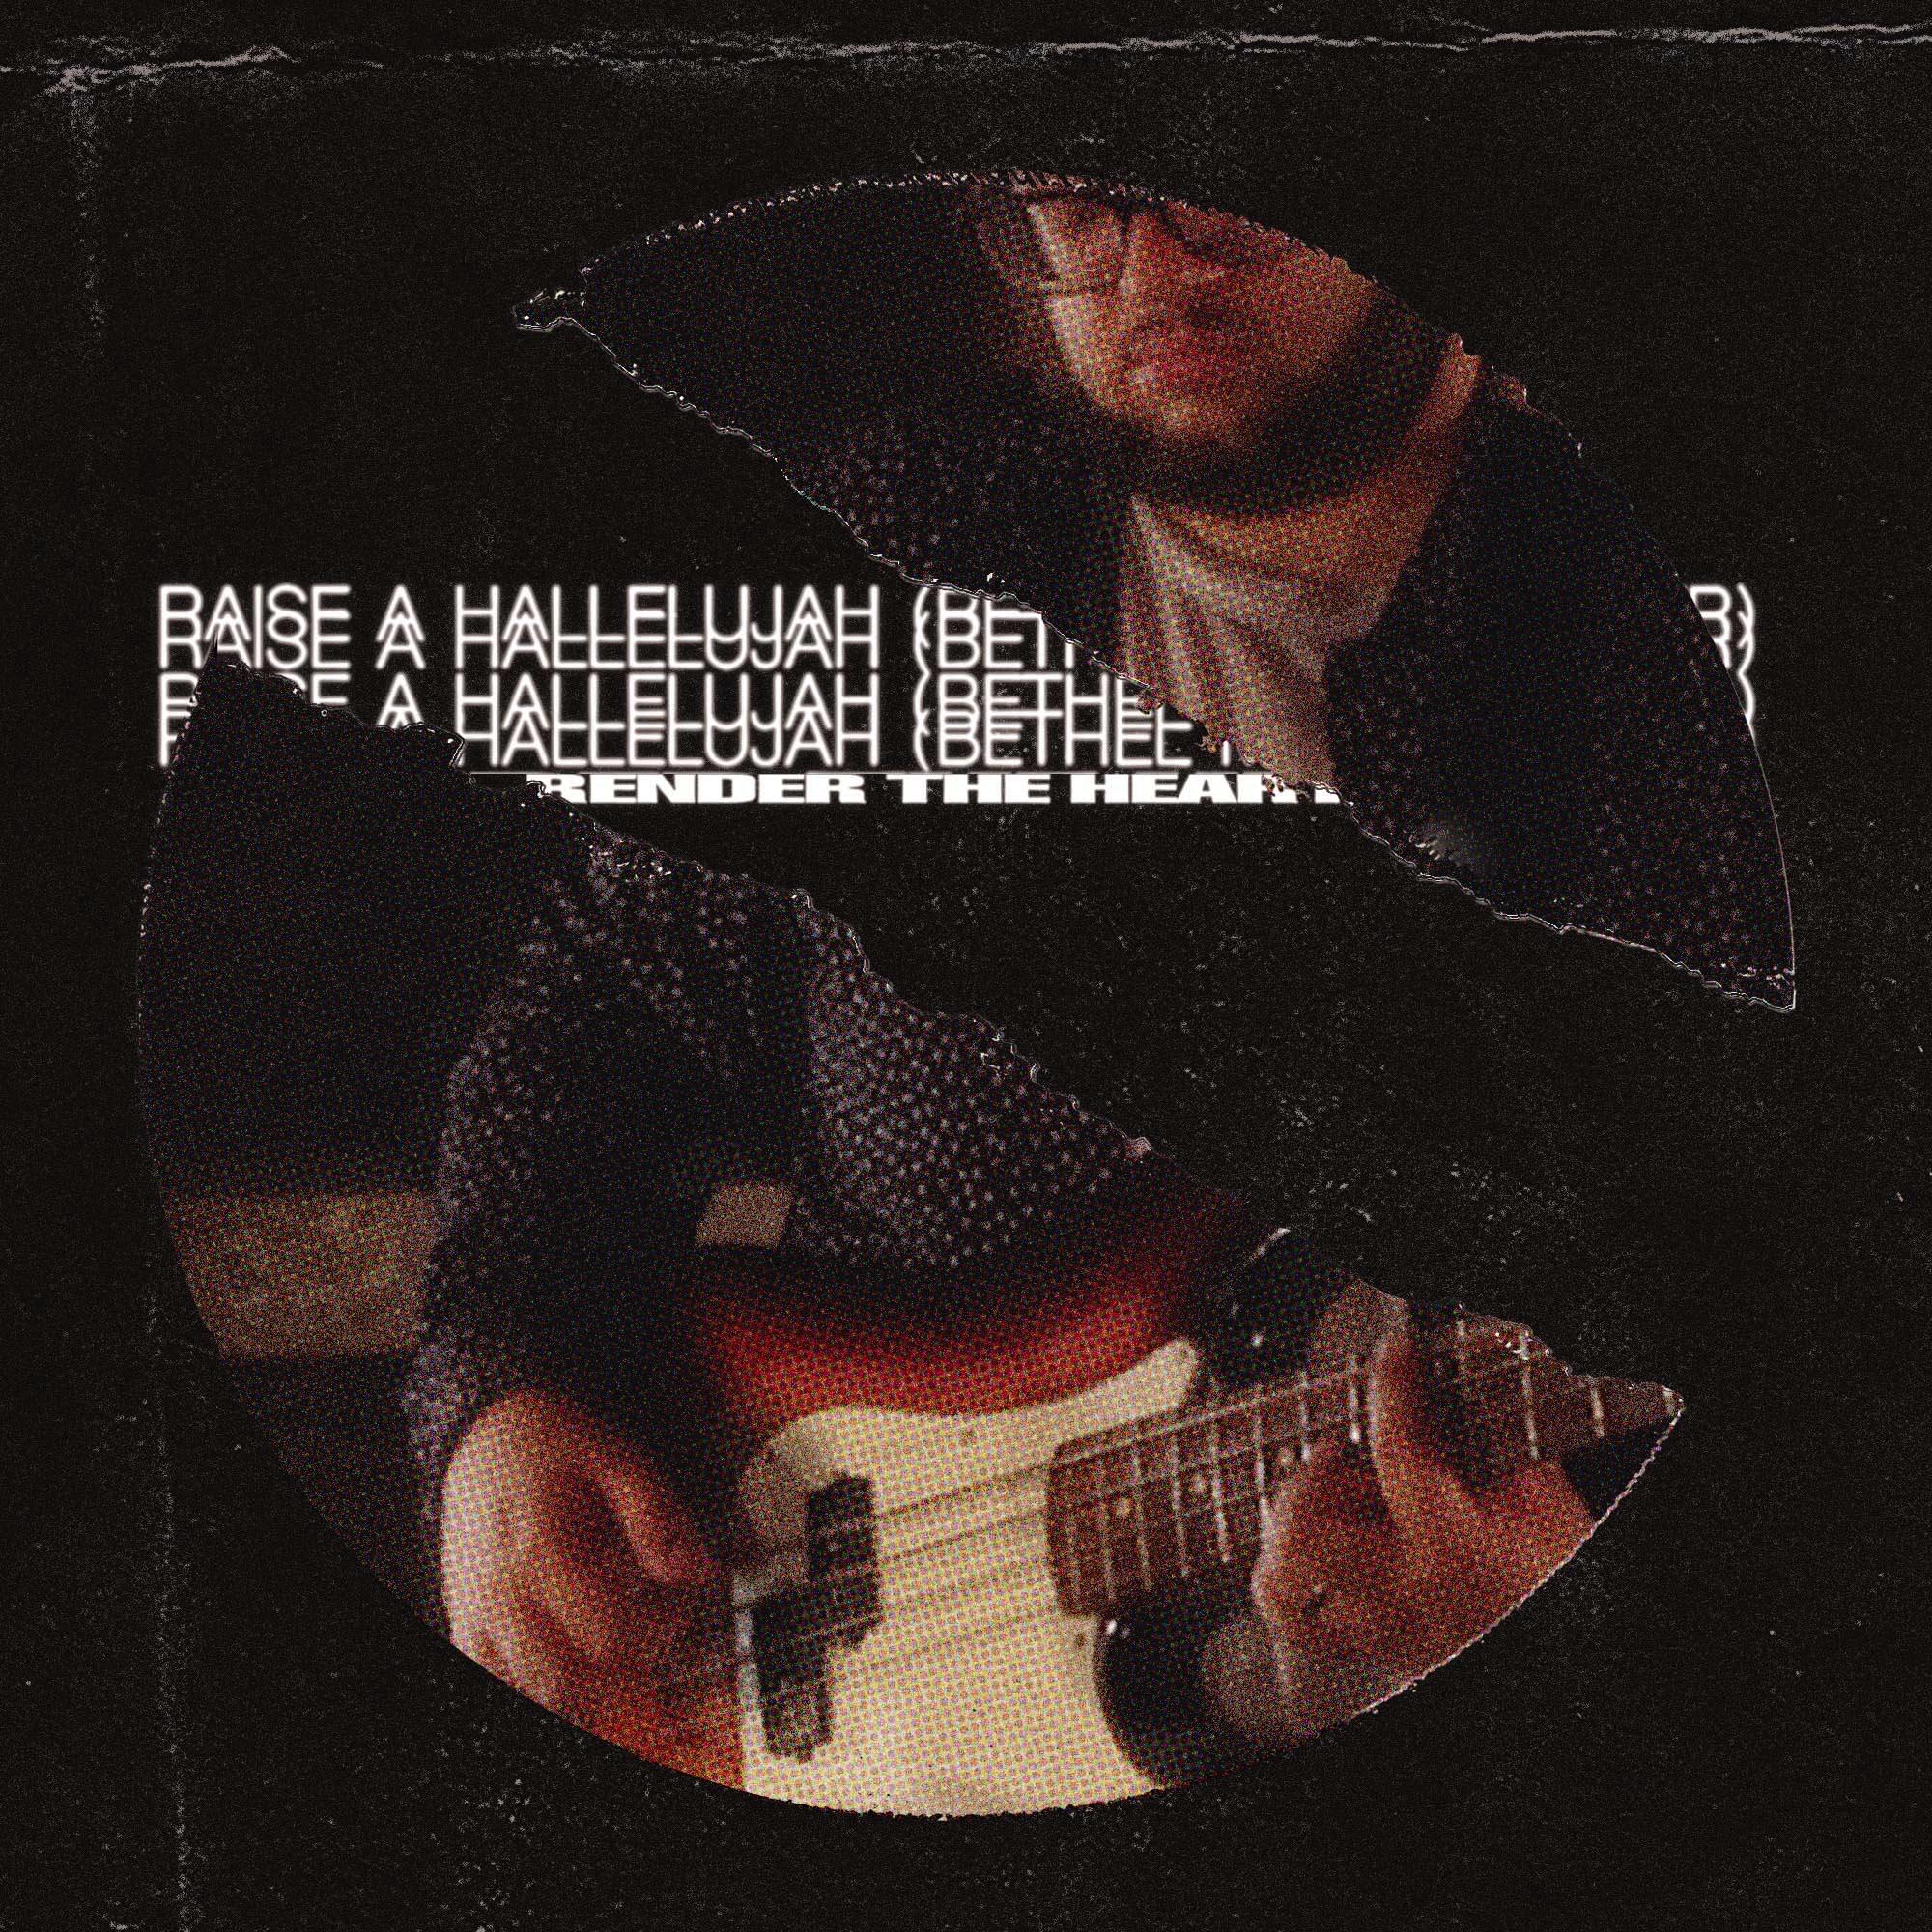 Raise a Hallelujah Cover Art.JPG